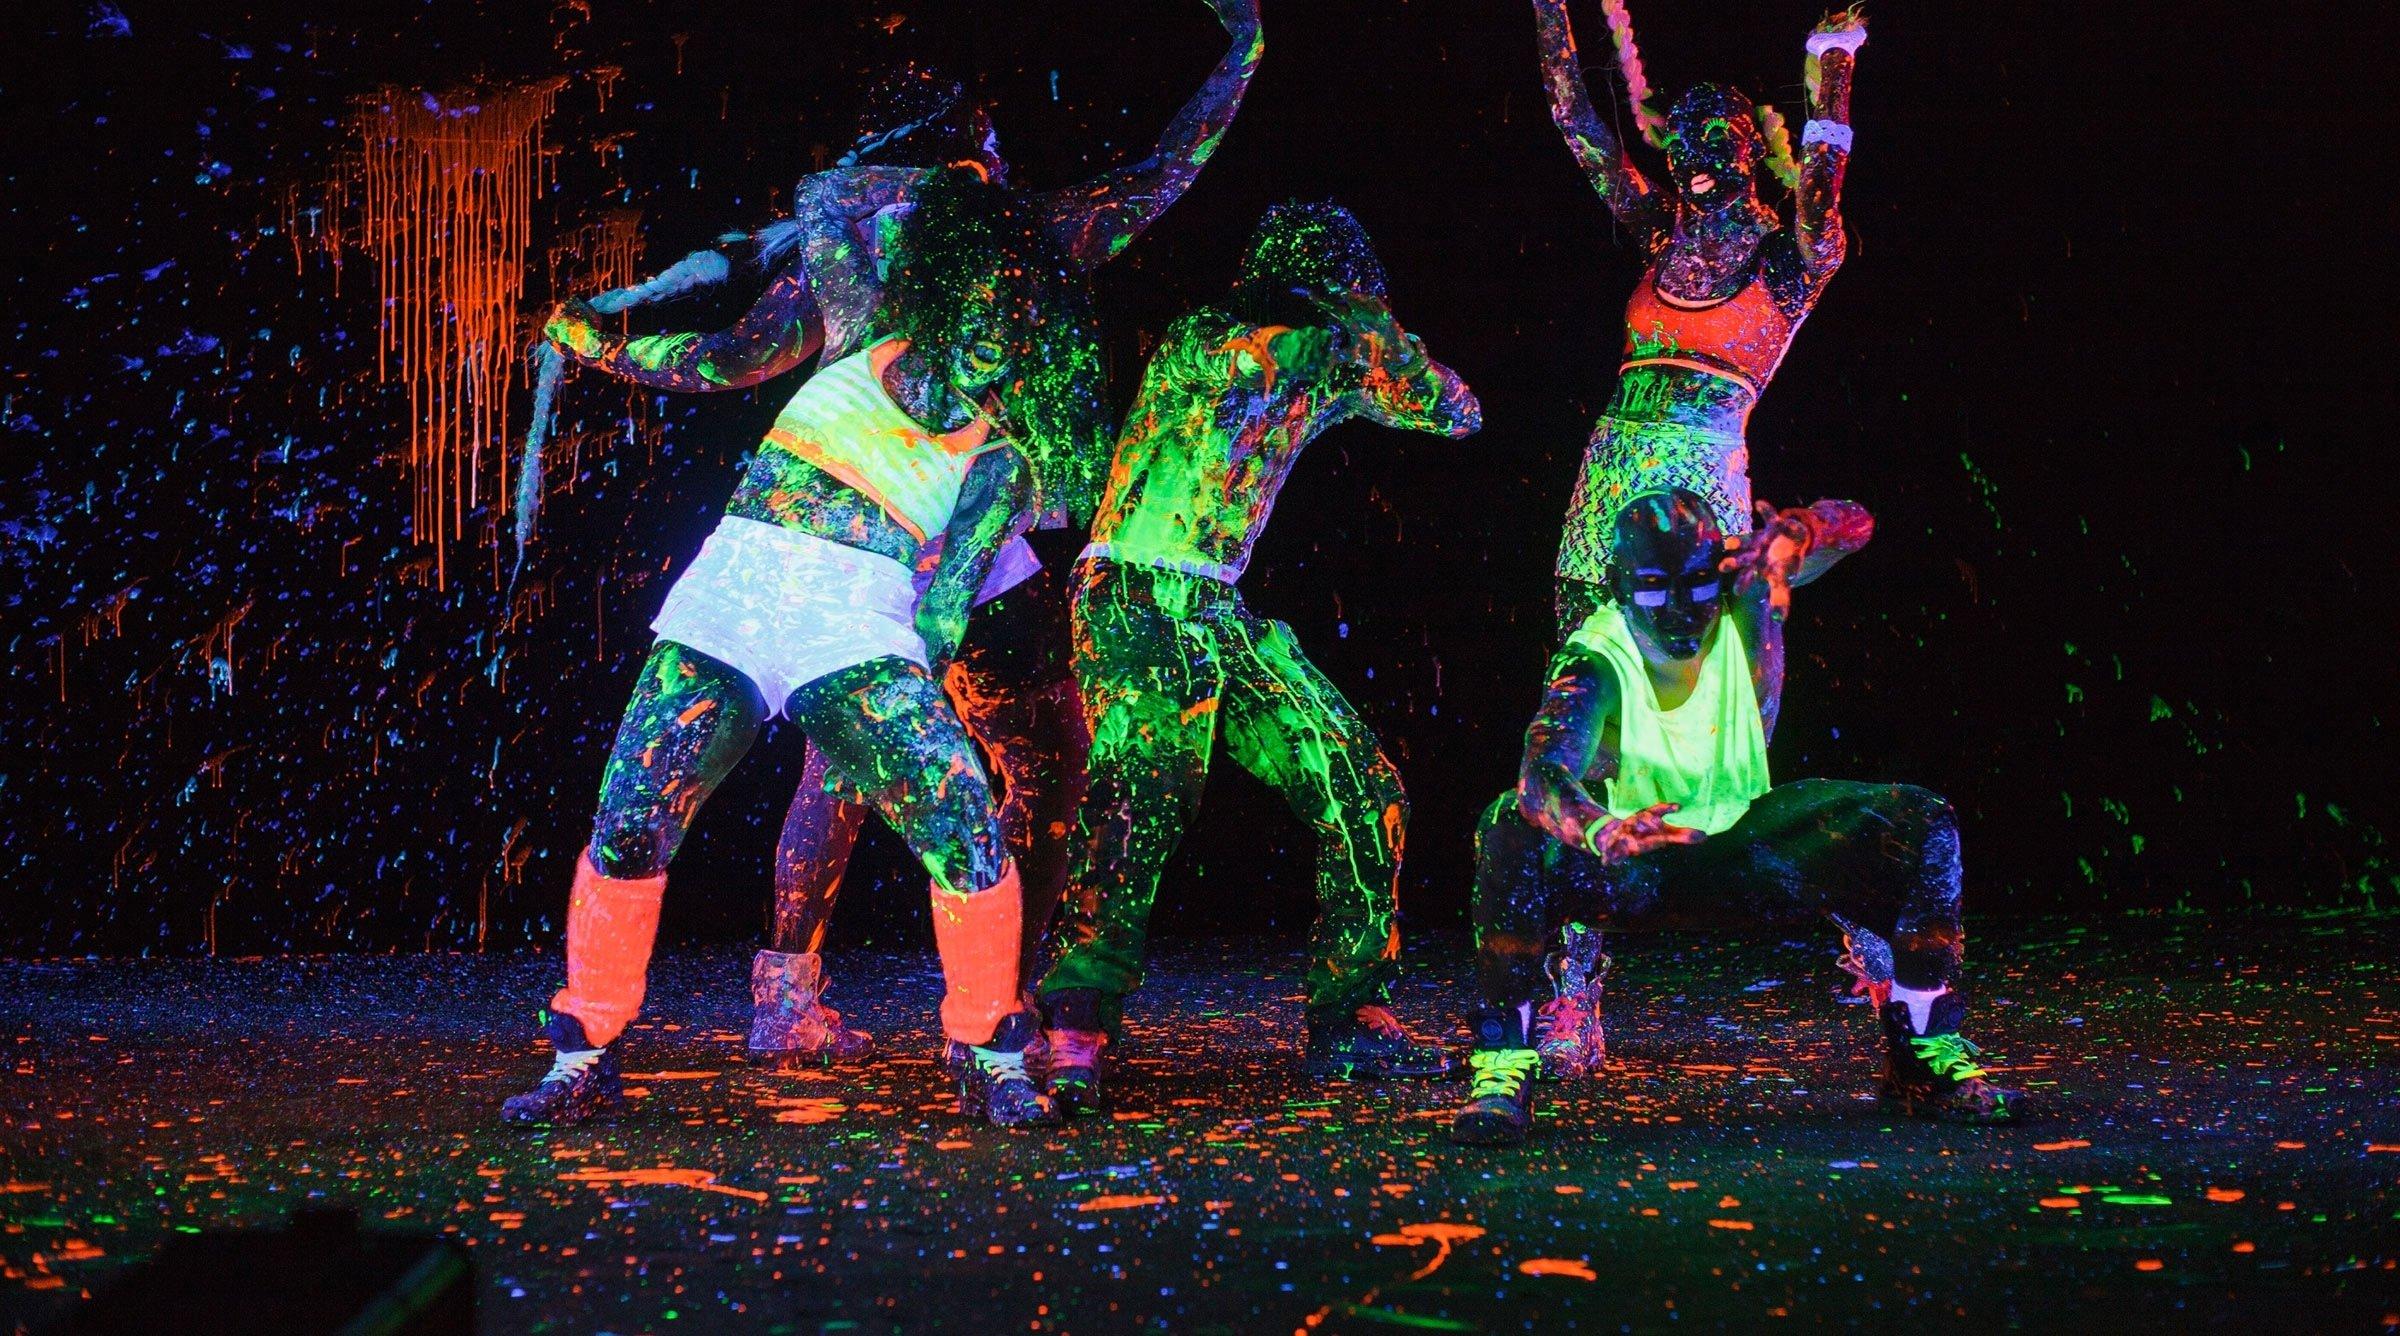 10 Fantastic Glow In The Dark Costume Ideas images for glow in the dark outfit ideas glow in the dark 1